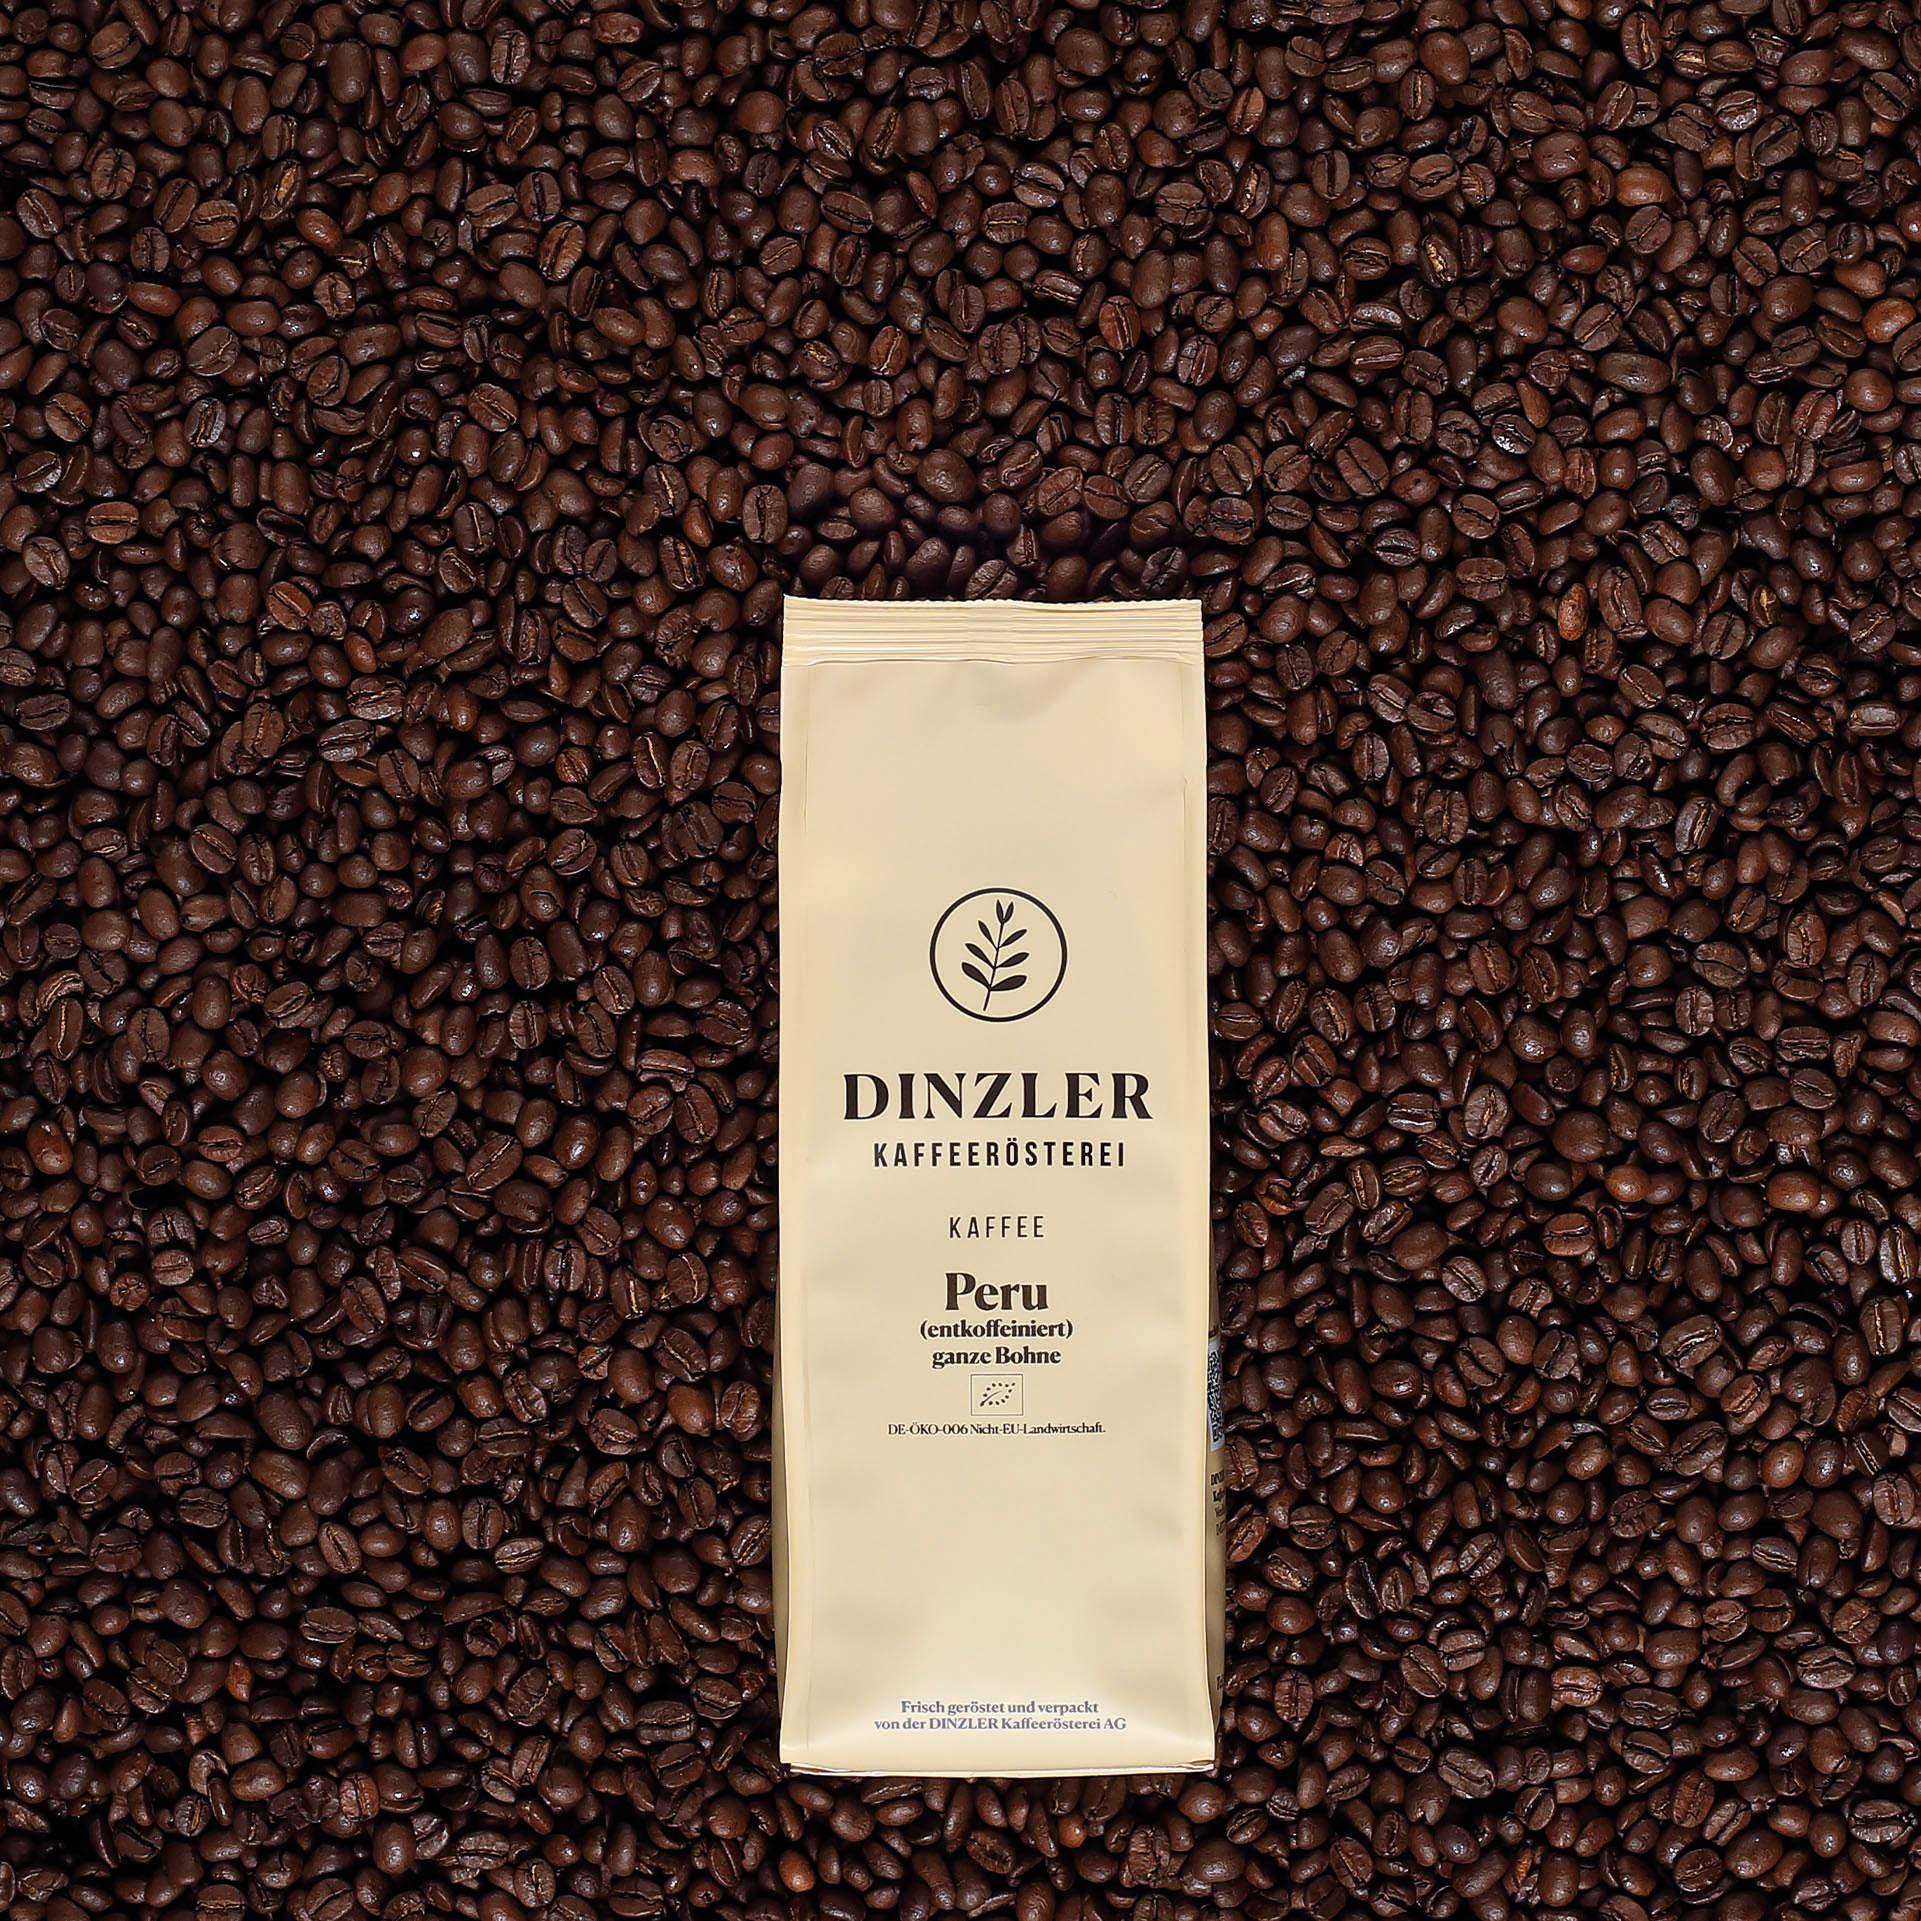 Kaffee Peru | DINZLER Shop